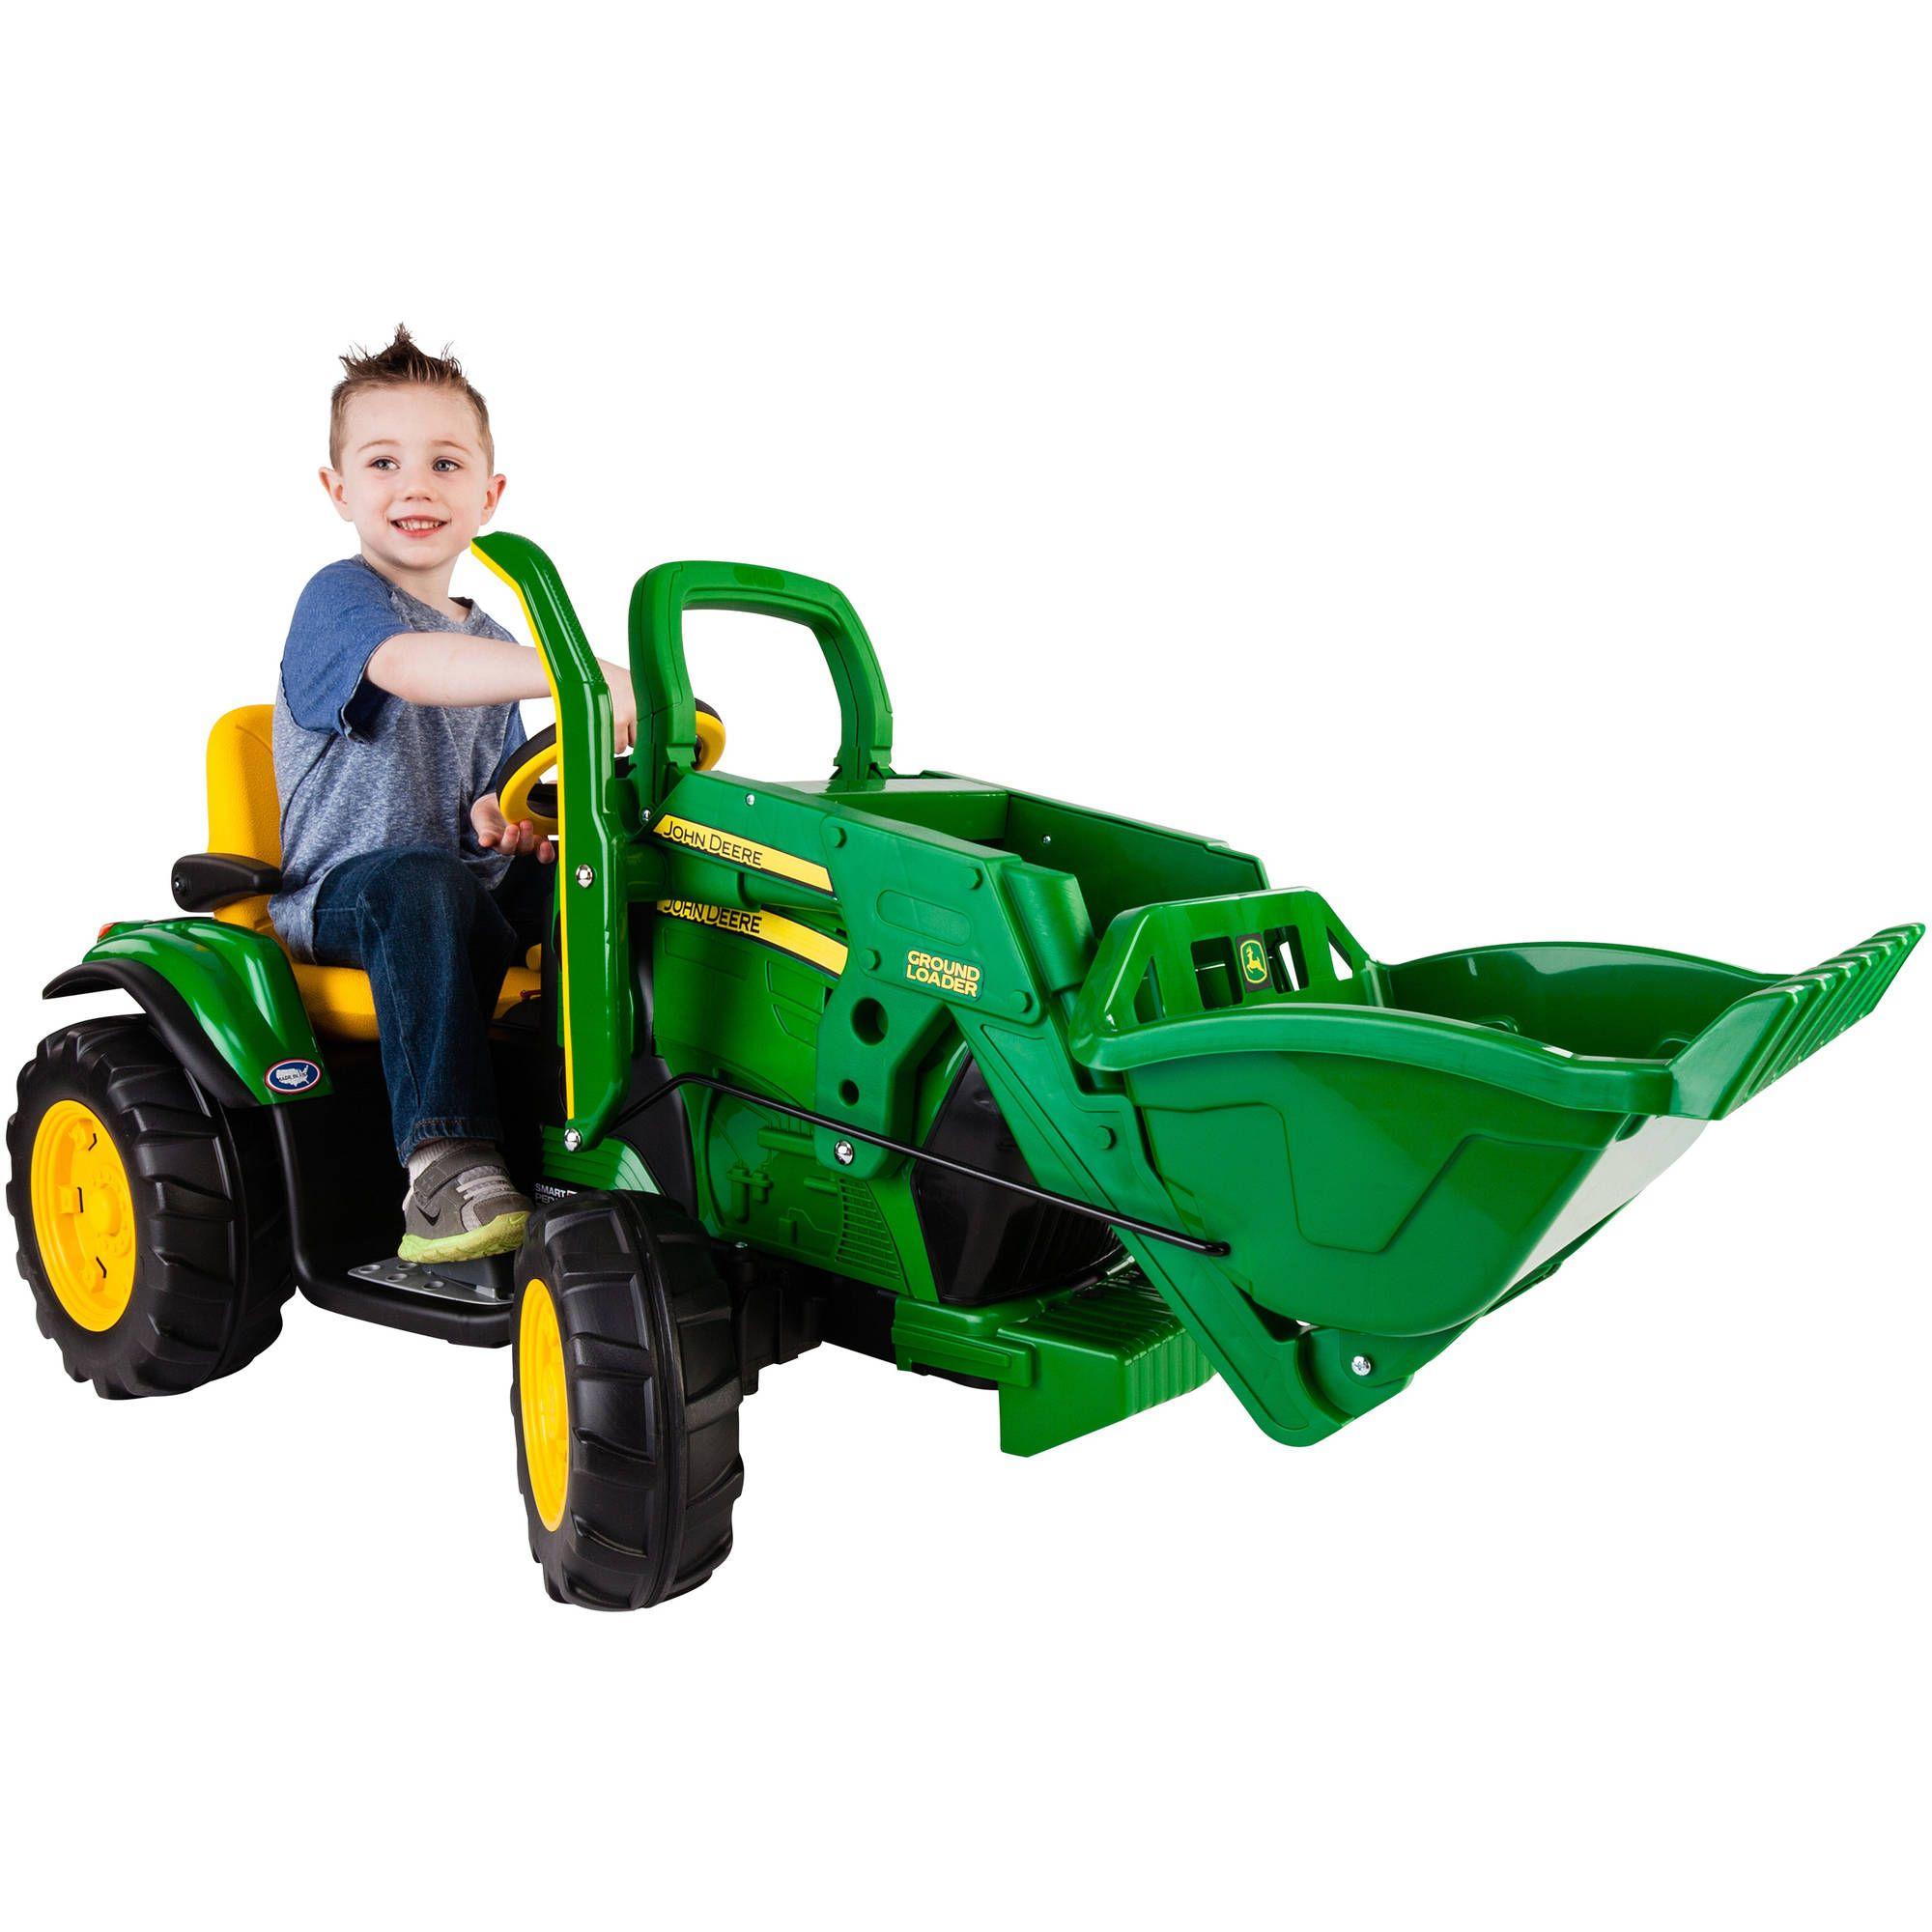 2 Wheel Toy Trailer John Deere Stake-Side Trailer Peg Perego